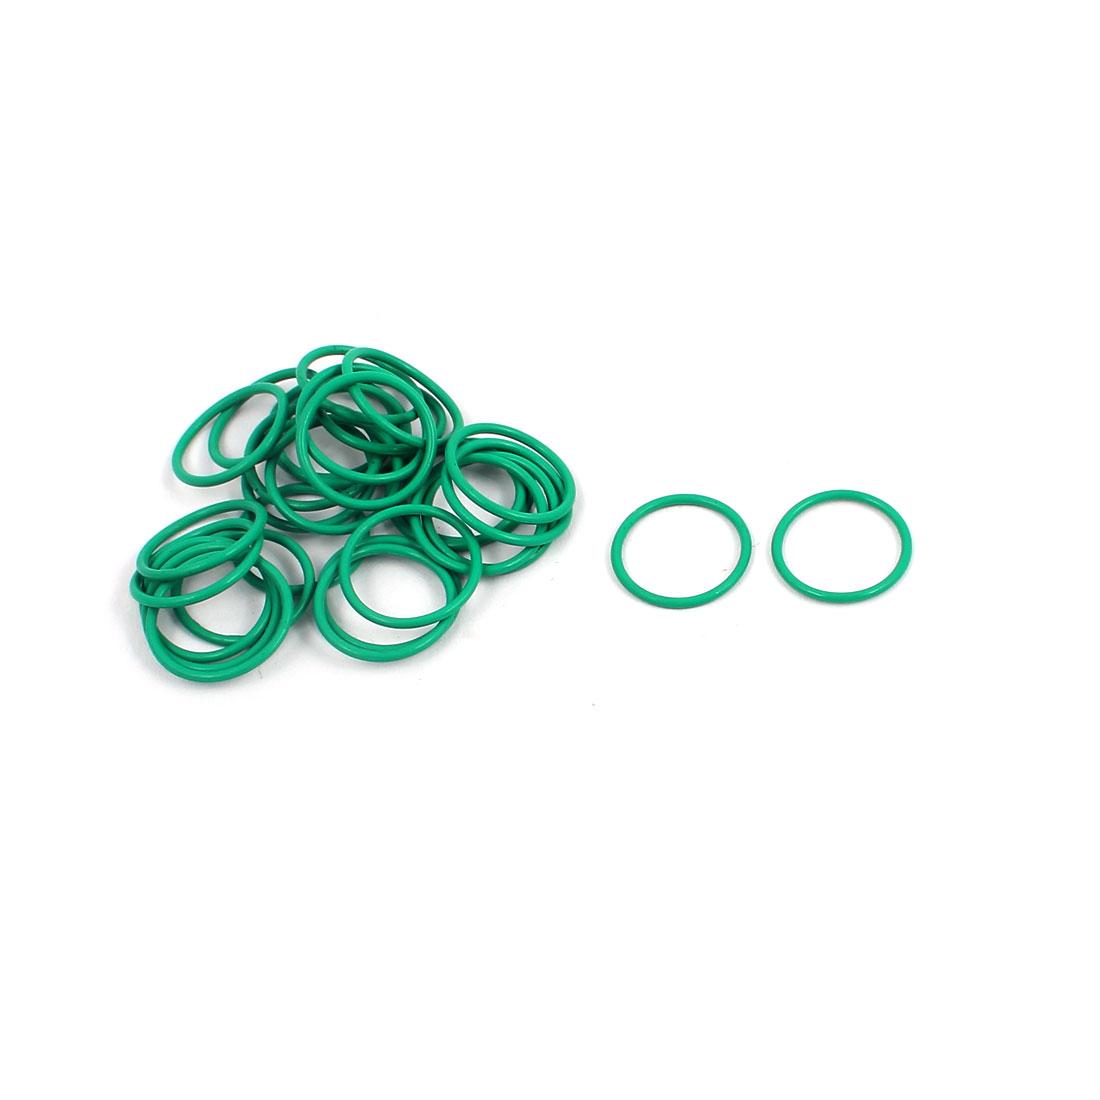 30Pcs 13mm x 1mm FKM O-rings Heat Resistant Sealing Ring Grommets Green